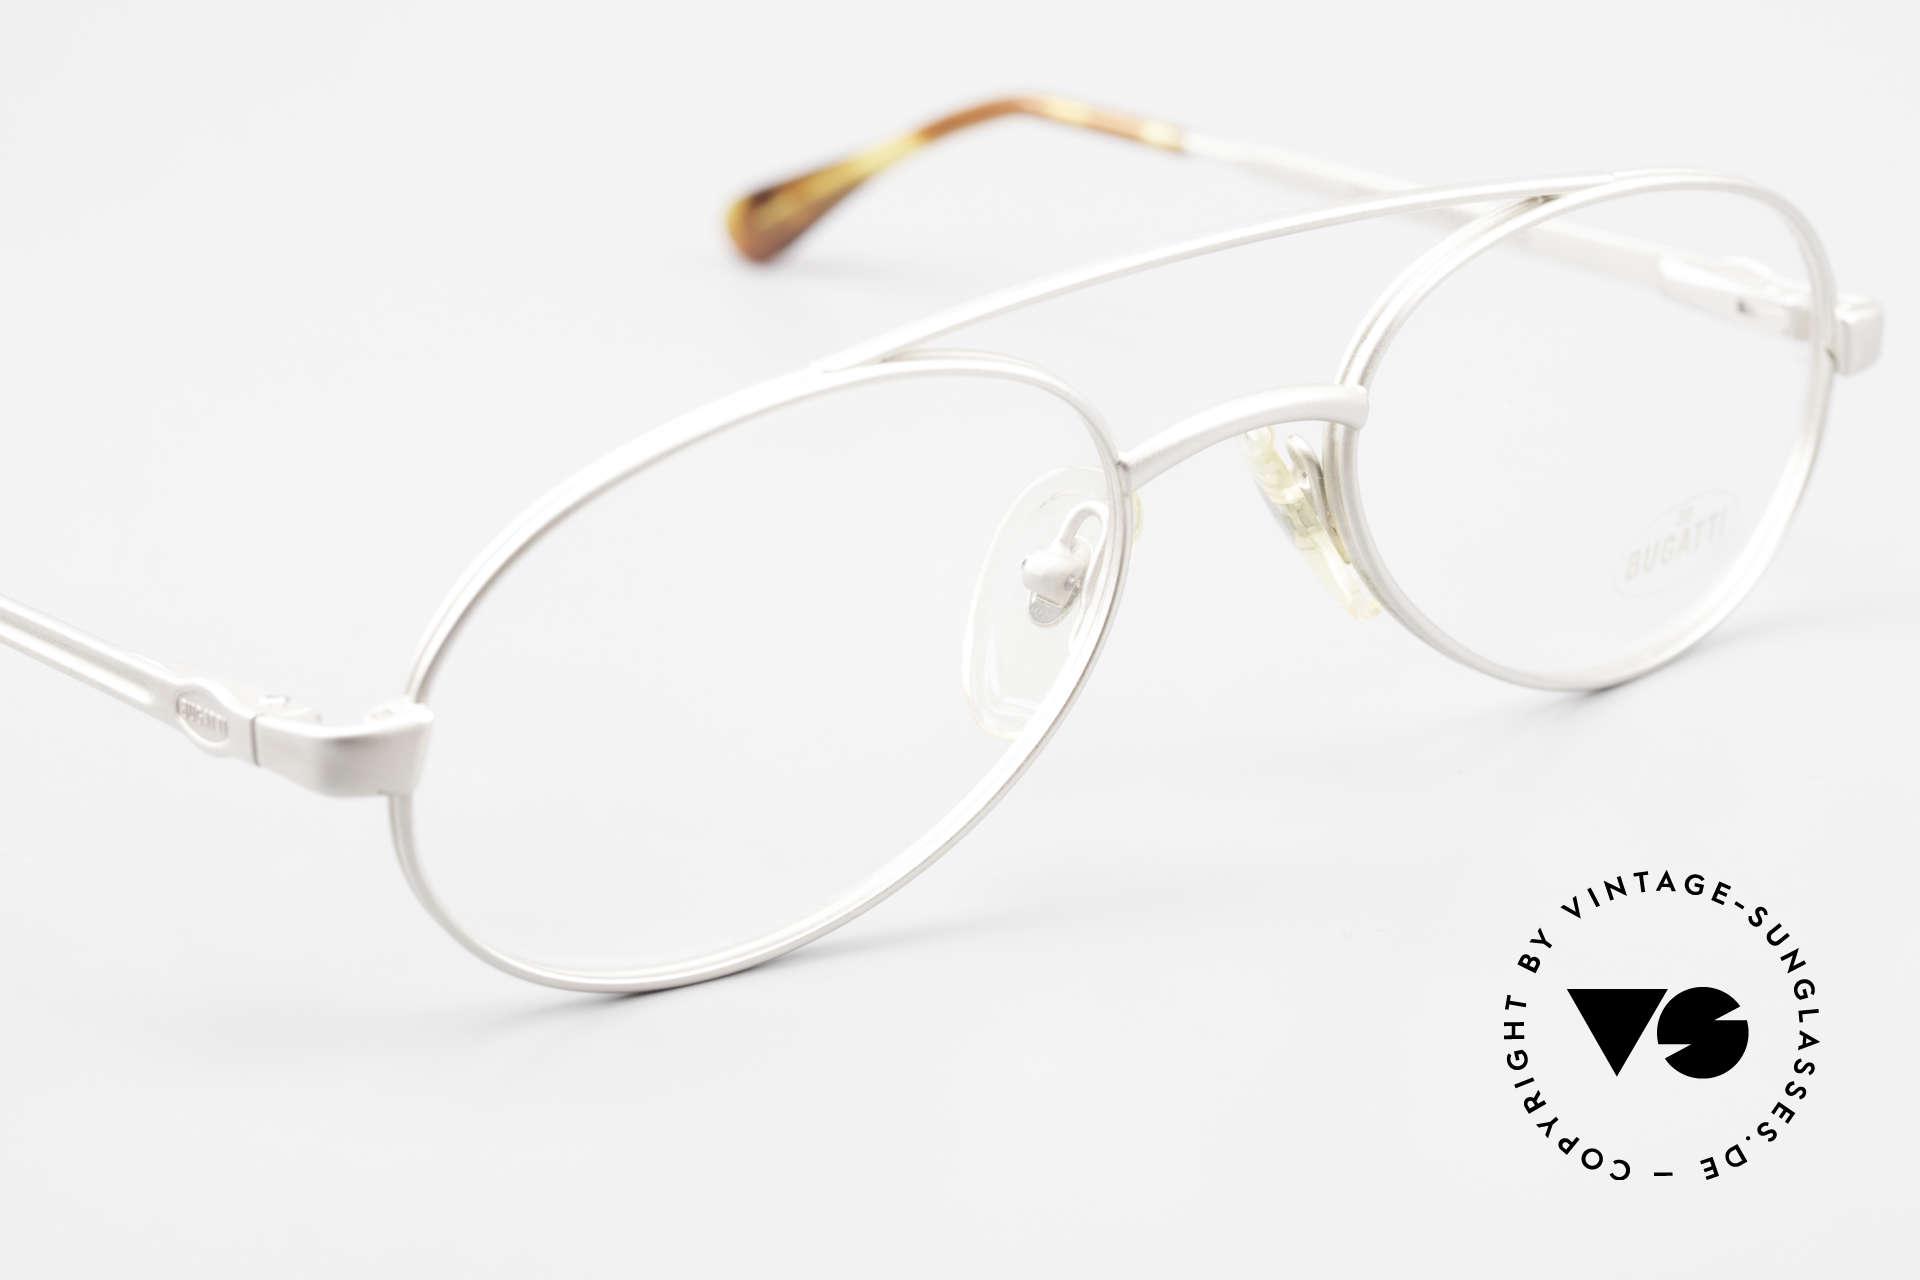 Bugatti 08105 Old Vintage Glasses 80's Men, NO RETRO frame, but a genuine eighties original, Made for Men